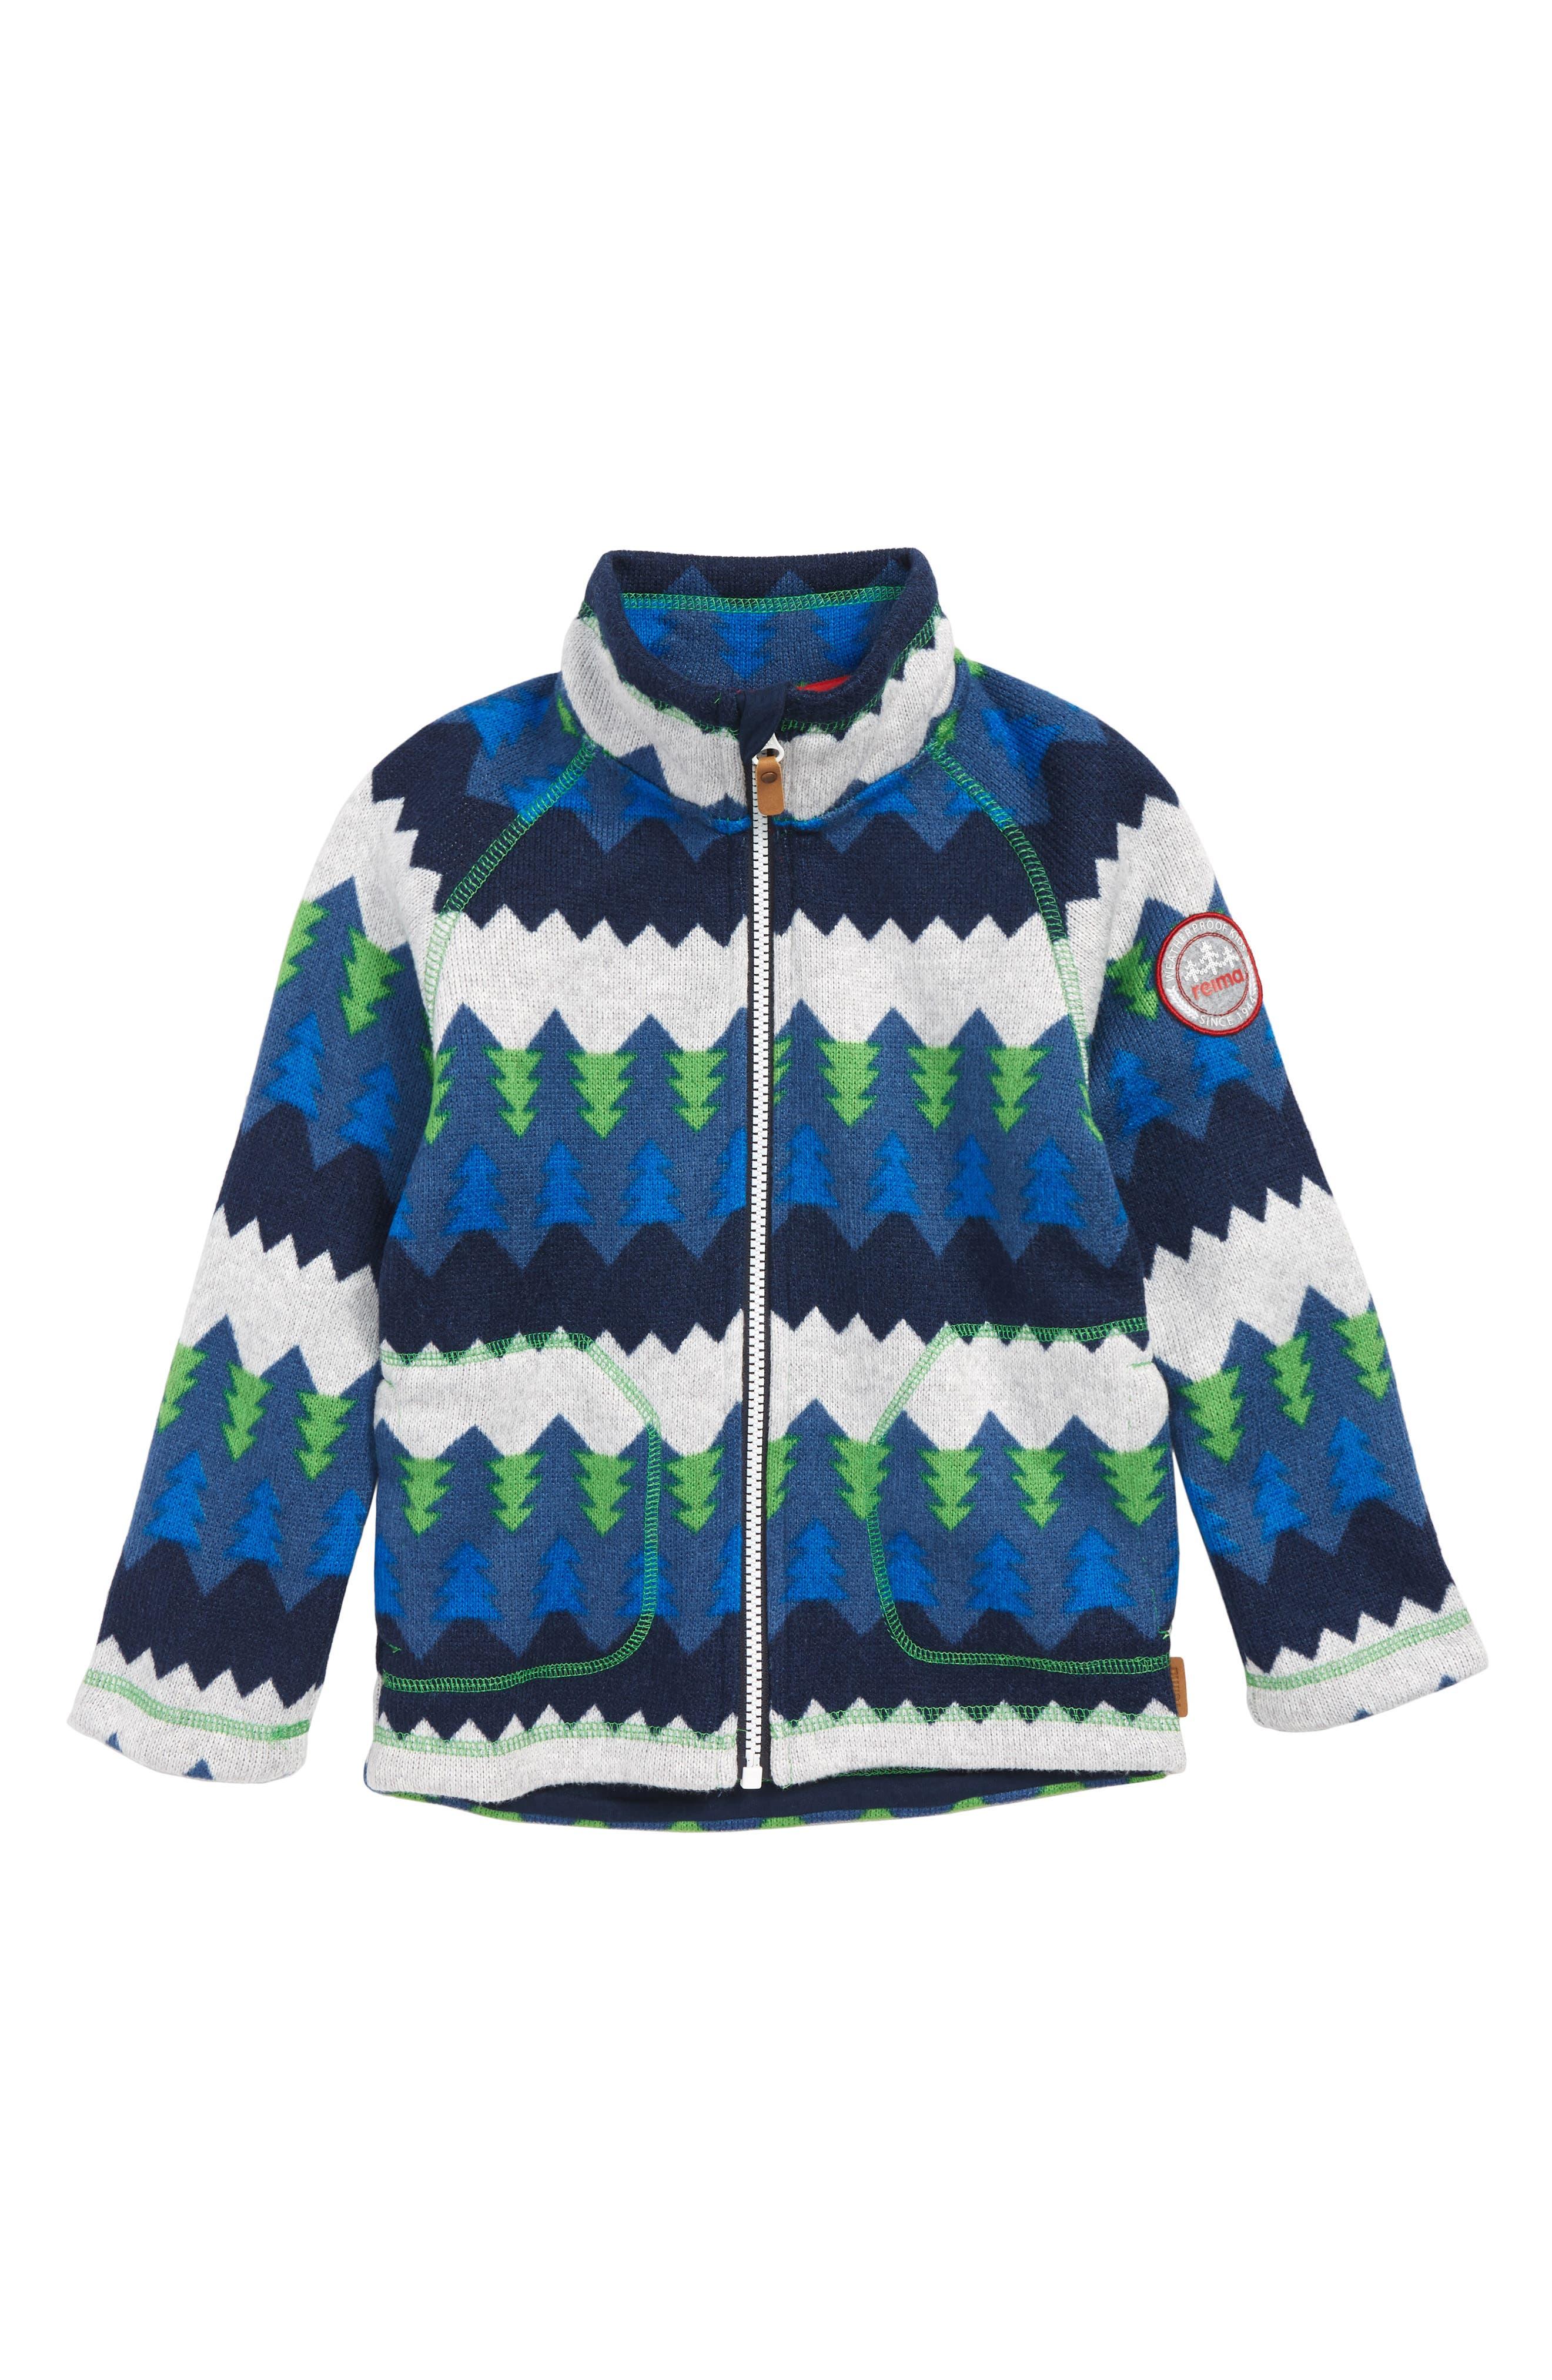 Boys Reima Brollies Knit Fleece Jacket